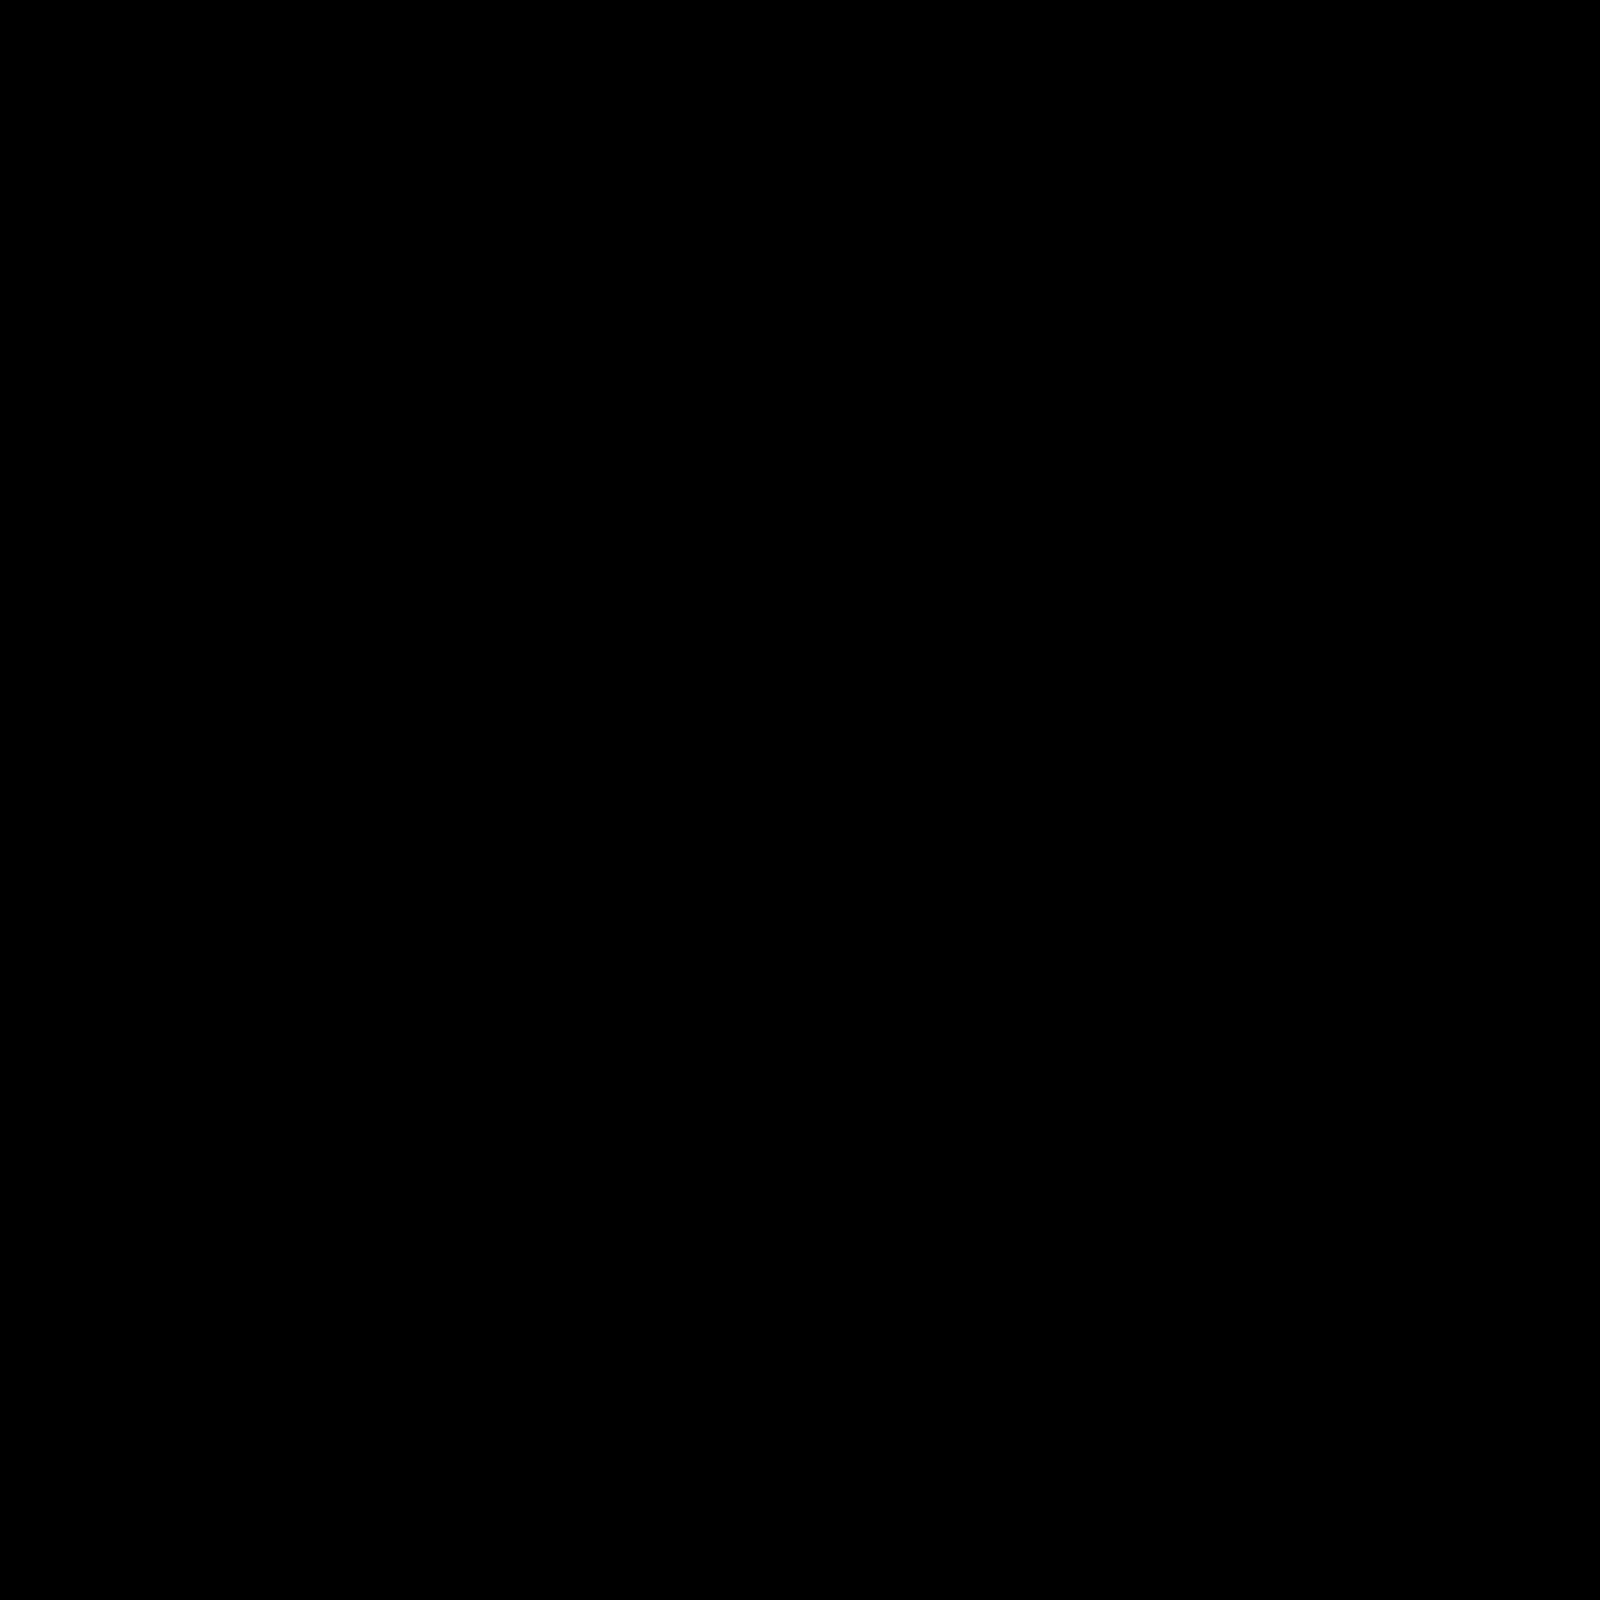 Batman Filled icon